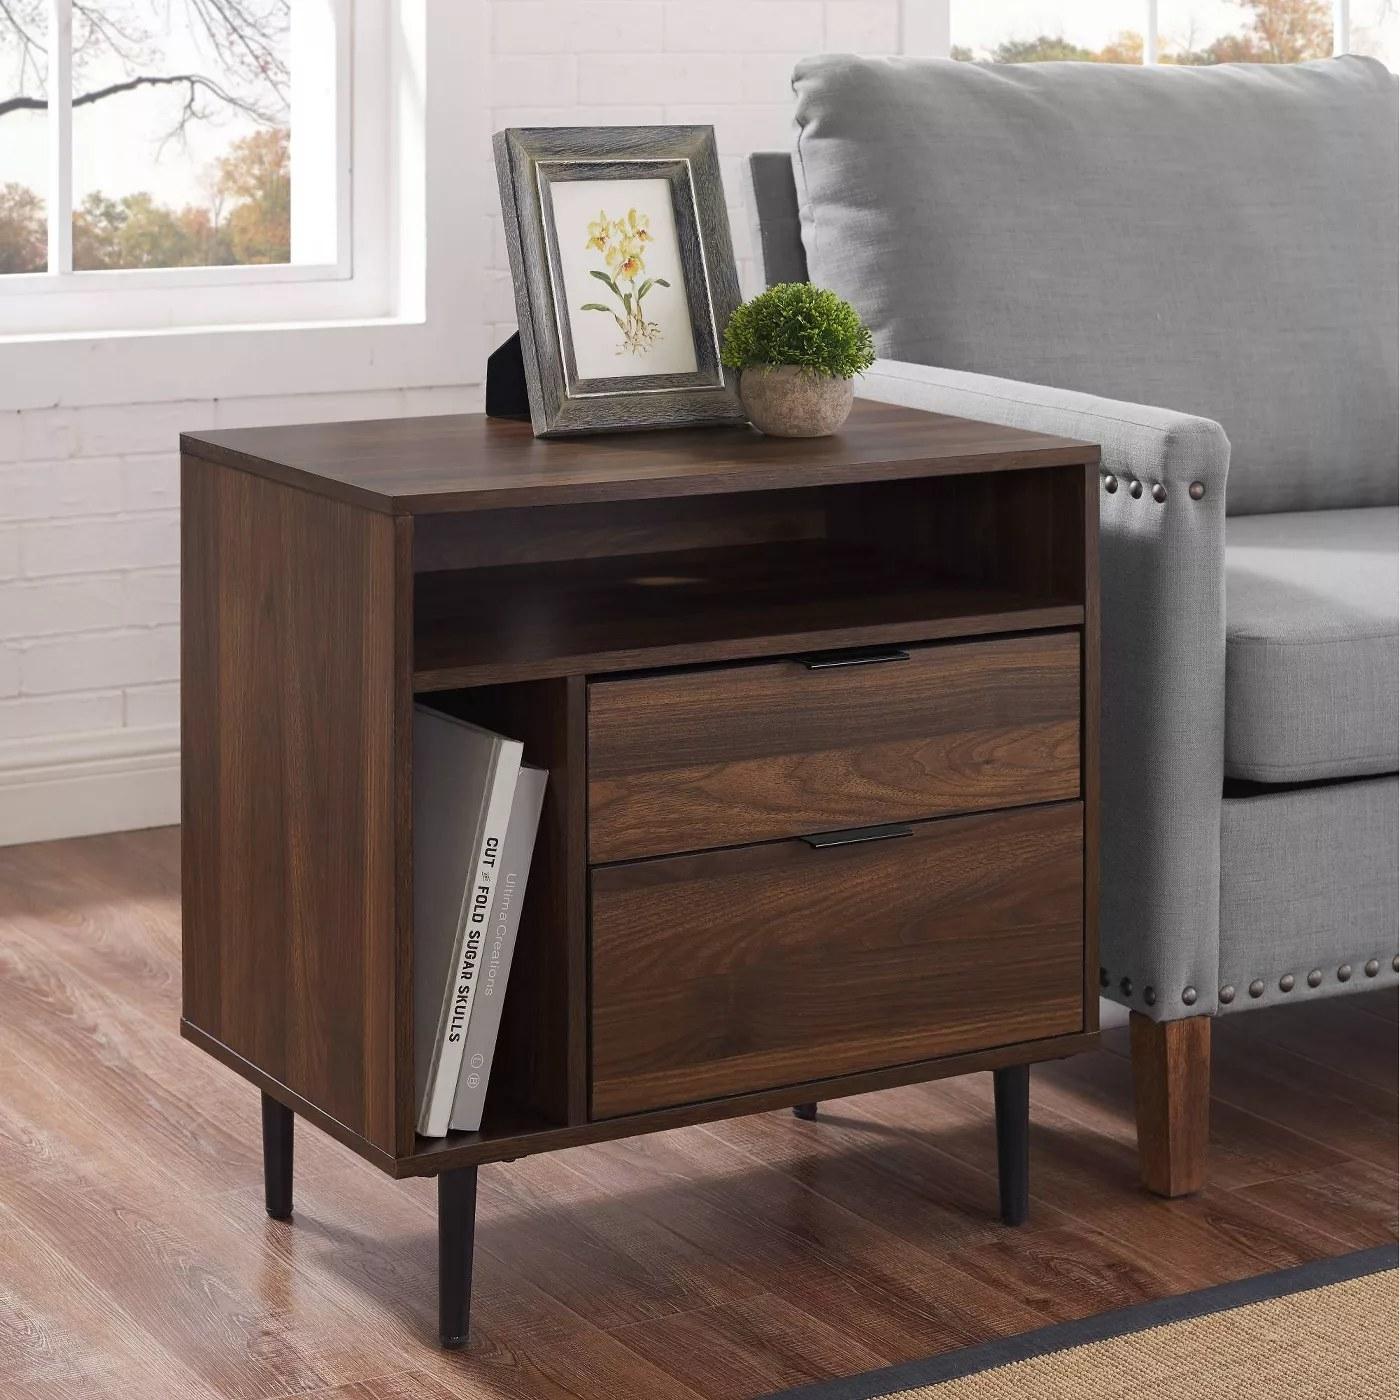 The nightstand in dark walnut